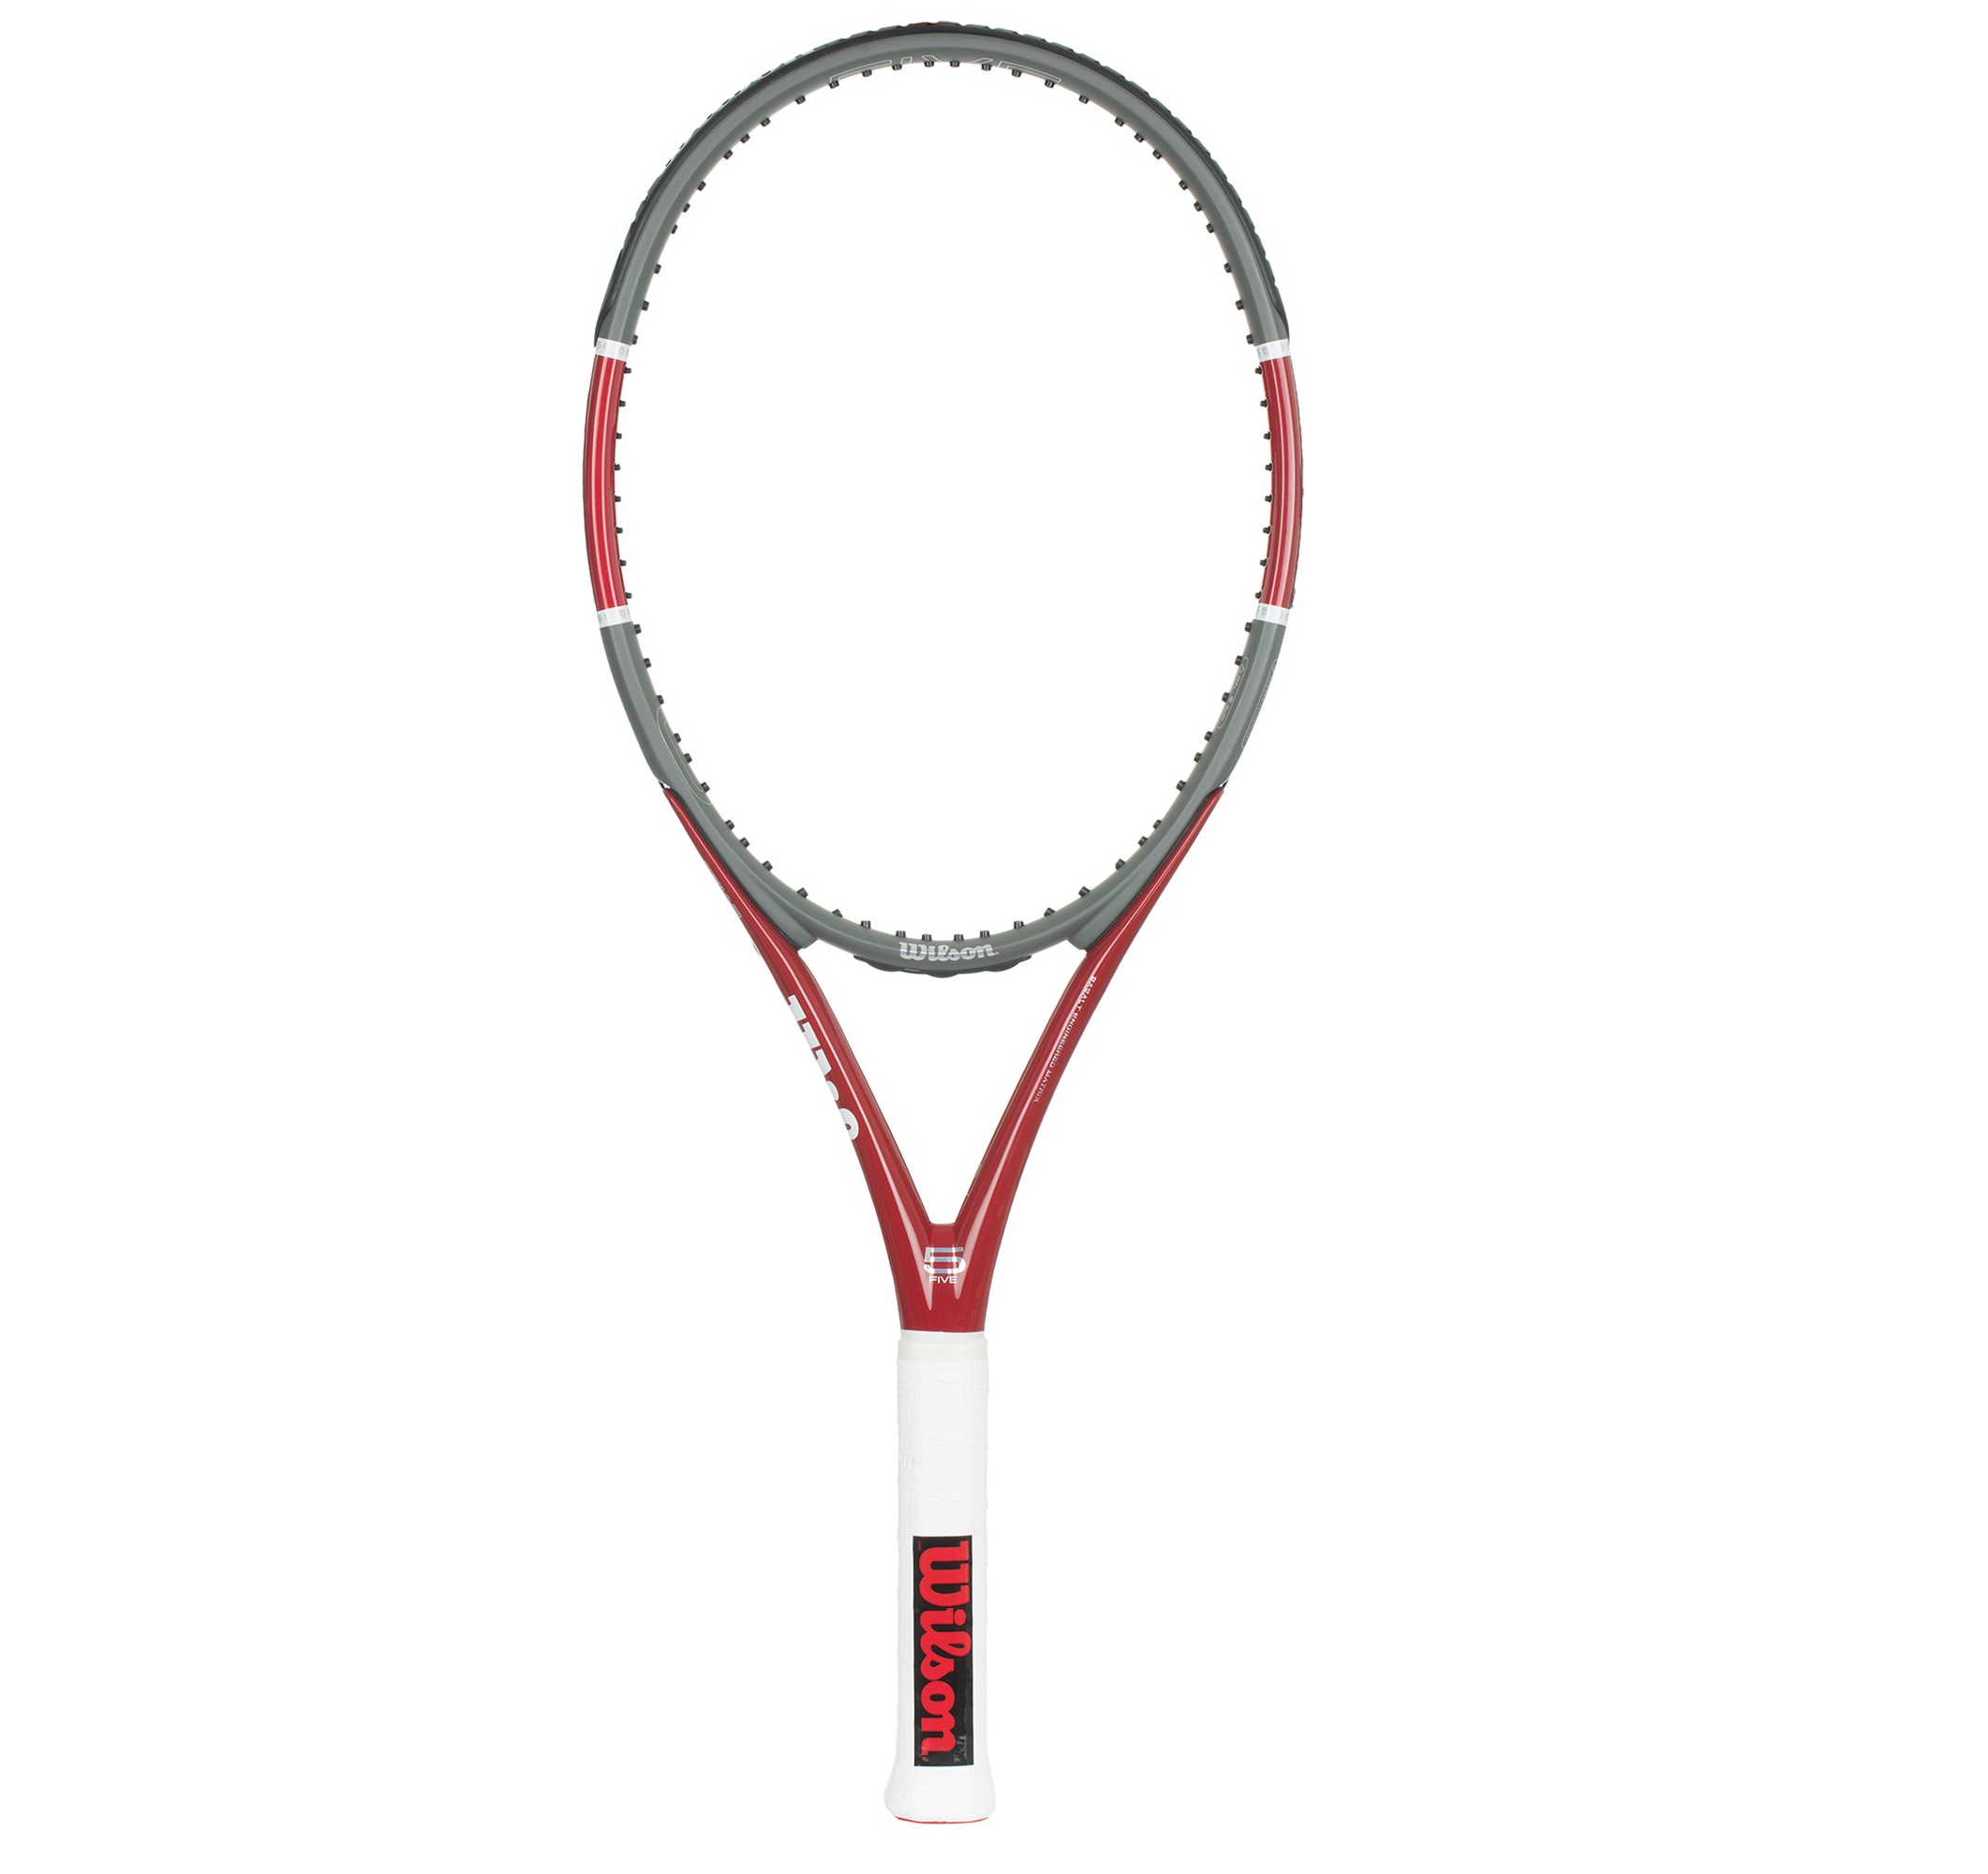 Wilson Ракетка для большого тенниса Wilson Triad Five 27, размер 3 wilson ракетка для большого тенниса детская wilson roger federer 23 размер без размера